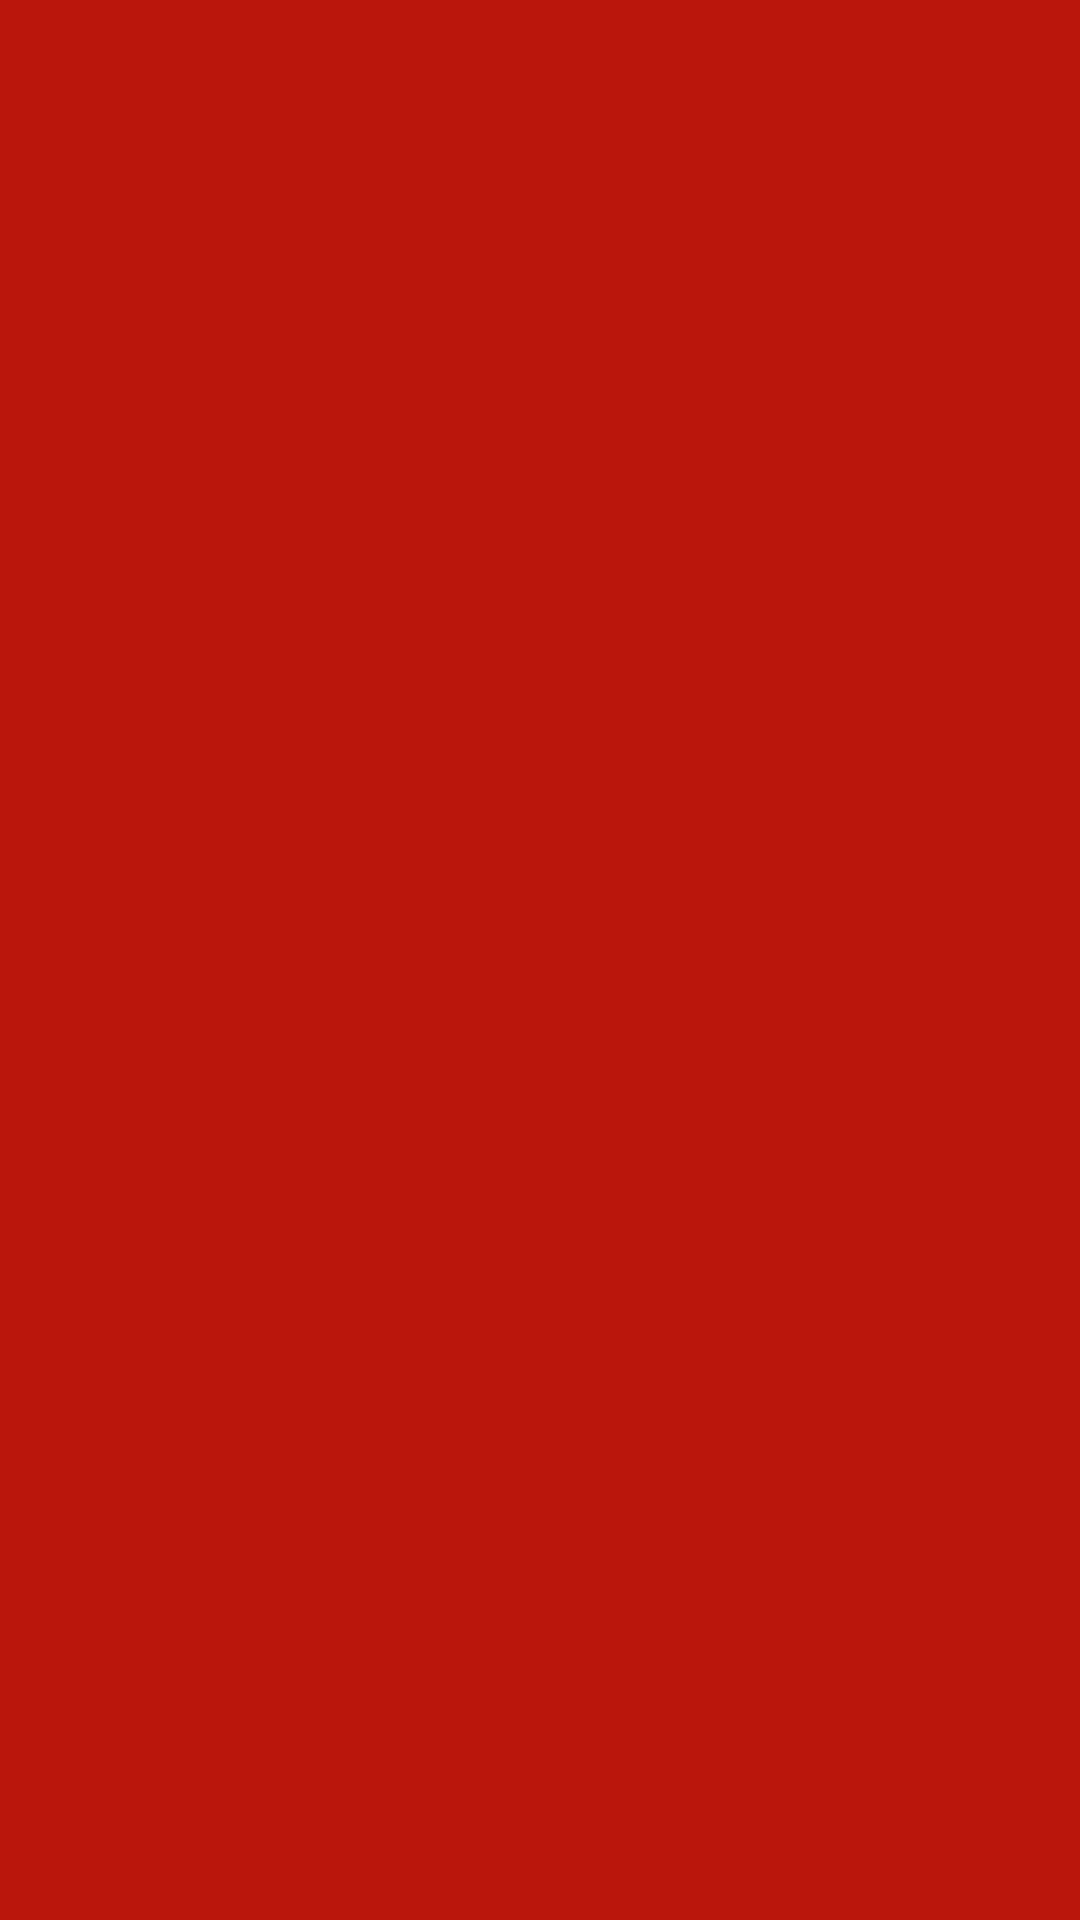 1080x1920 International Orange Engineering Solid Color Background